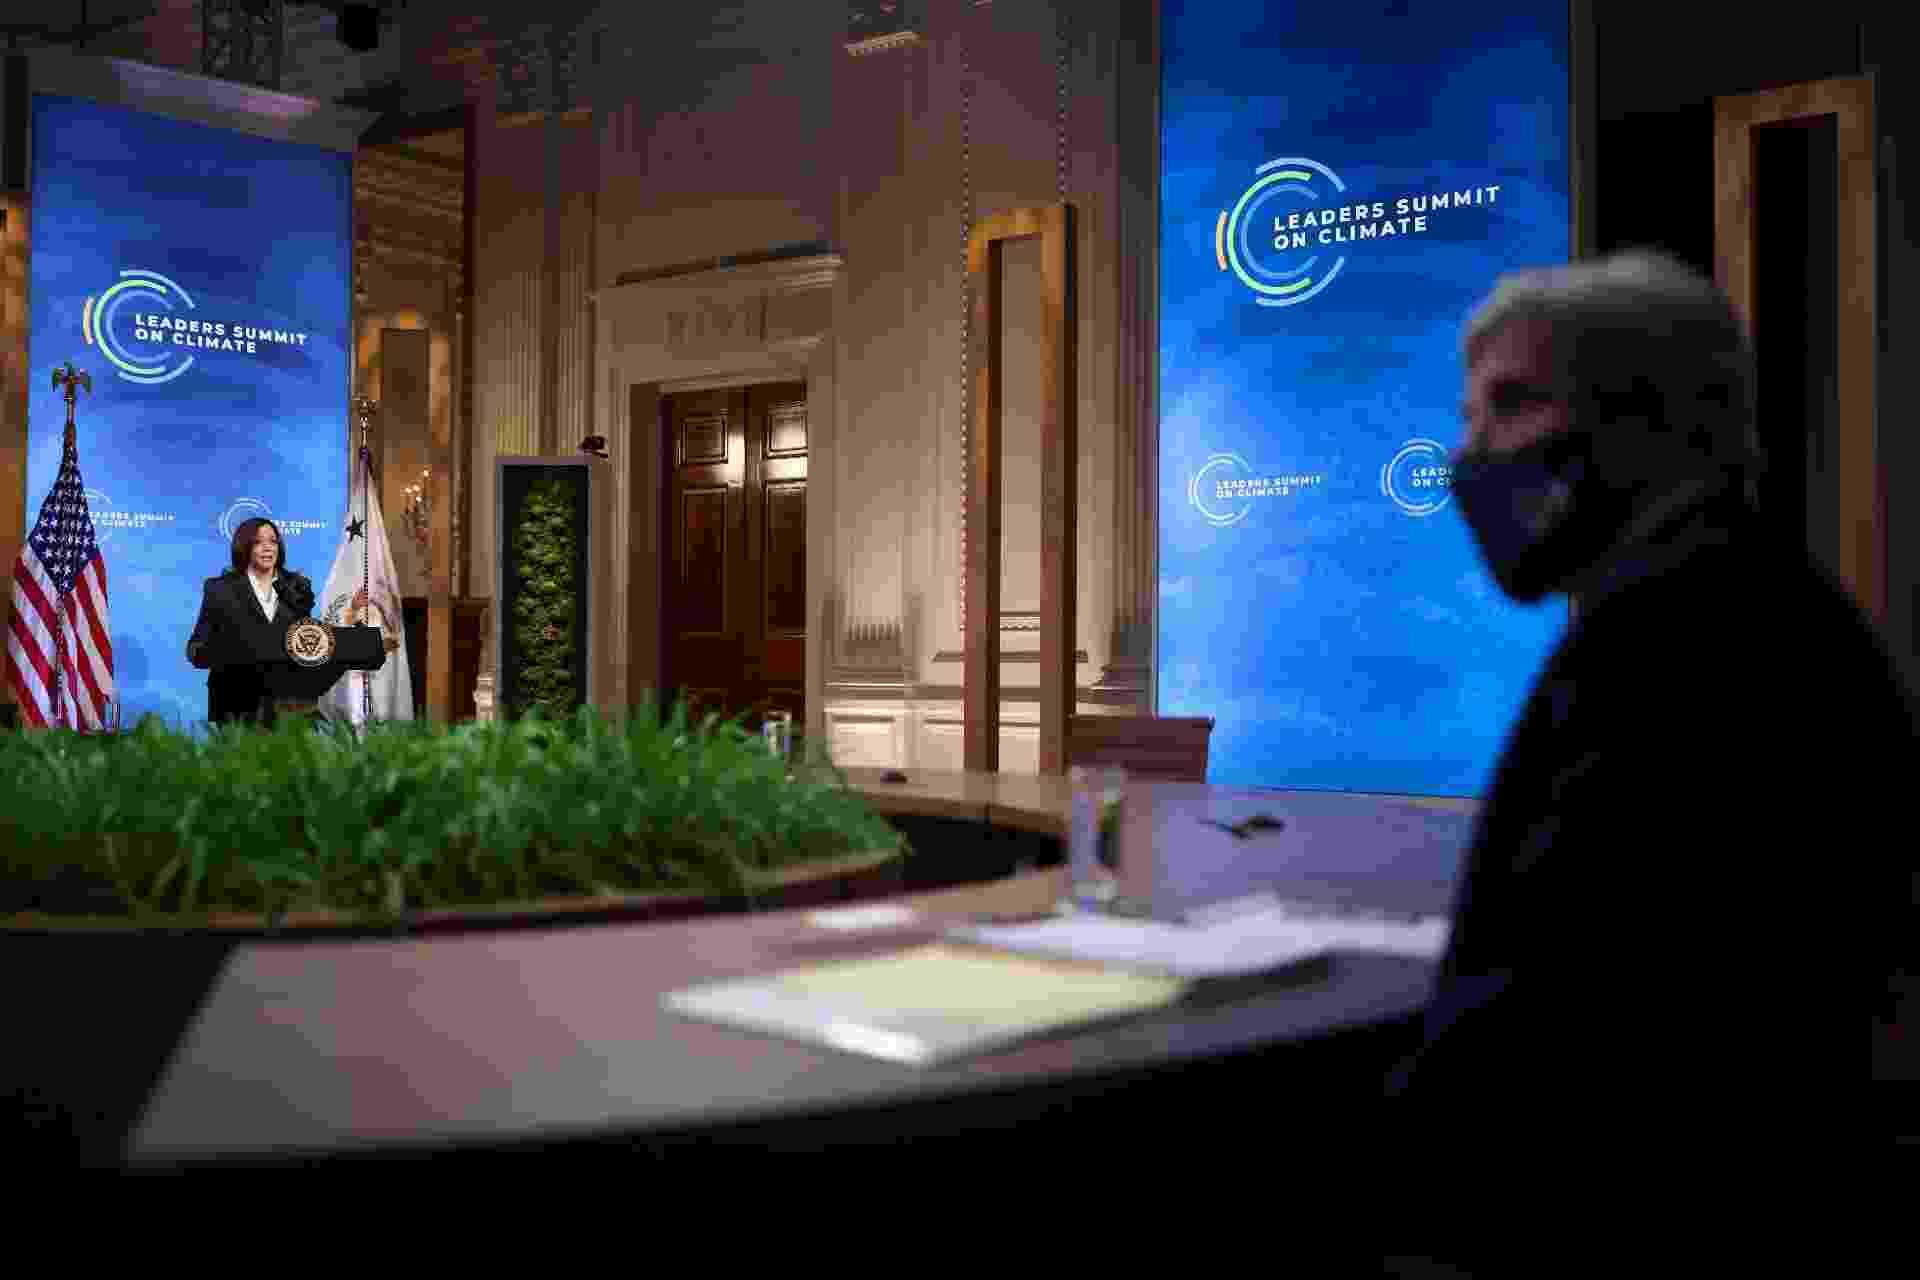 22.abr.2020 - Kamala Harris, vice-presidente dos Estados Unidos, discursa na Cúpula do Clima, na Casa Branca, em Washington - REUTERS/Tom Brenner